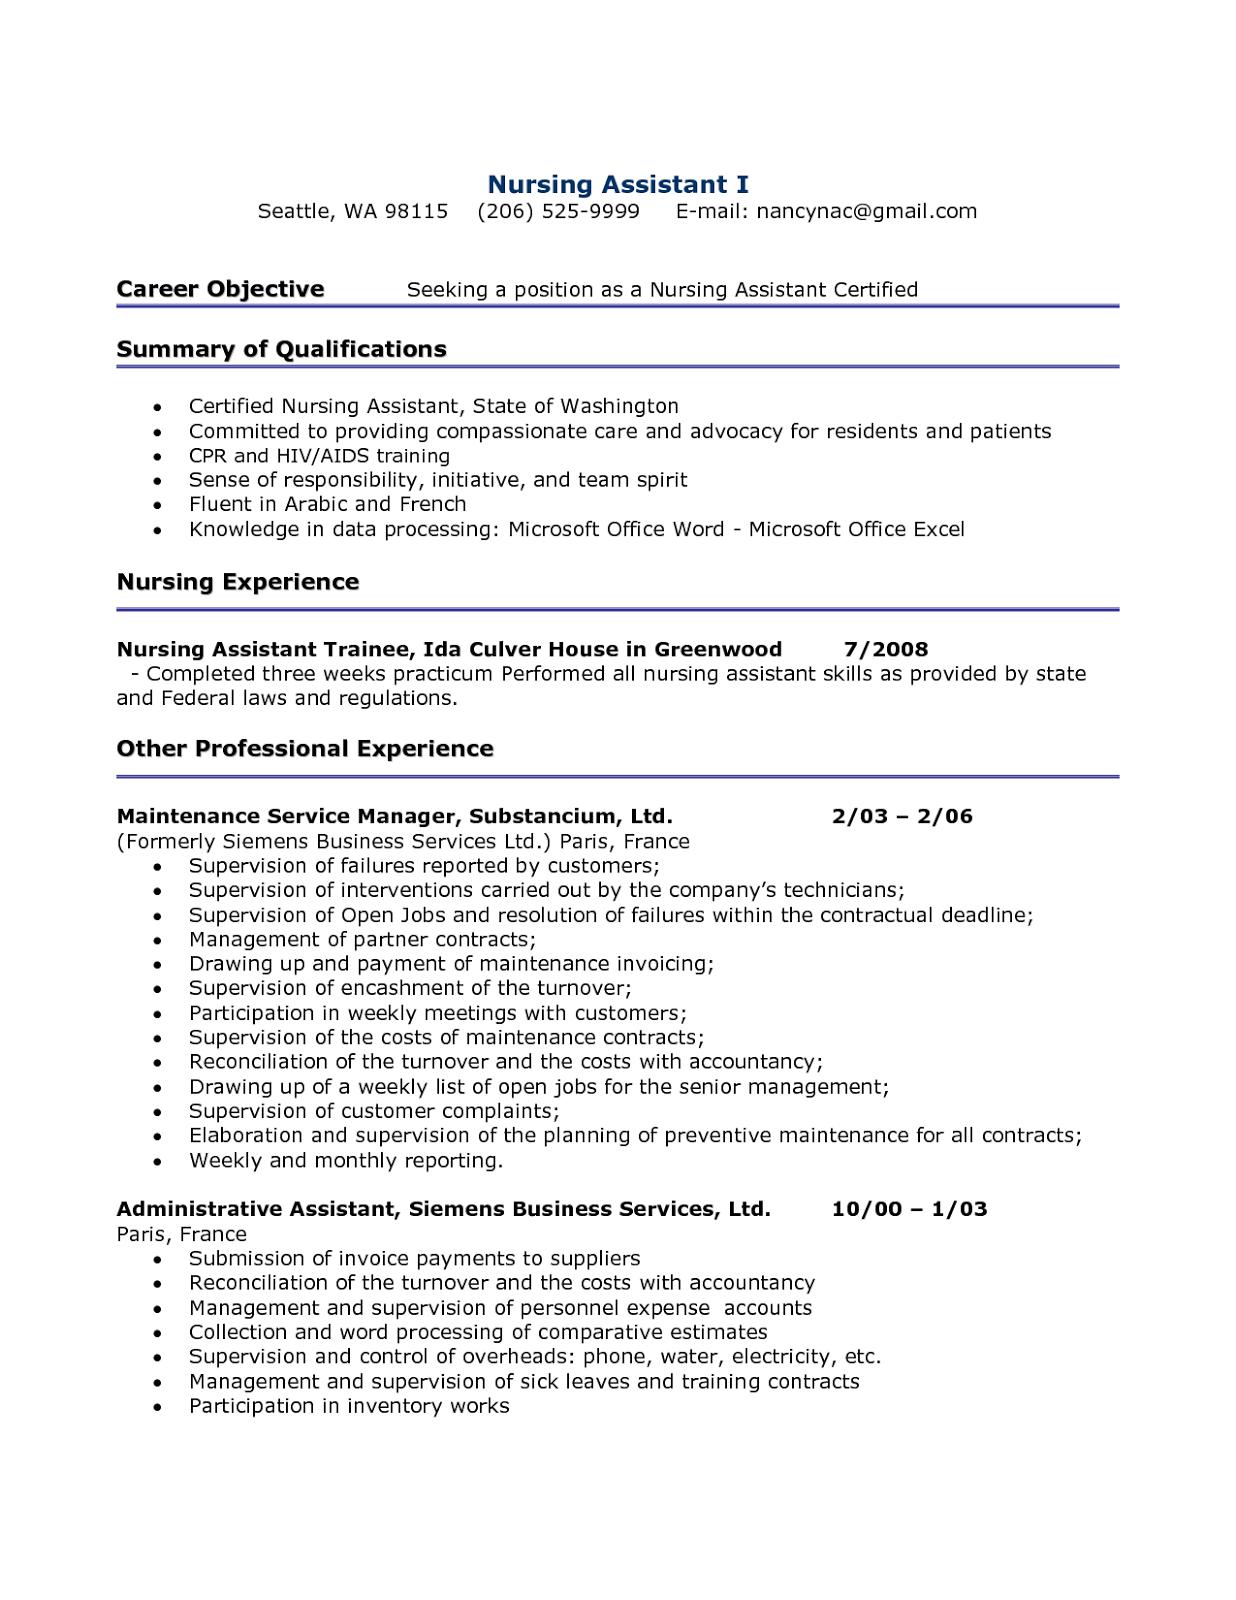 certified nurse assistant resume, cna resumes, cna resume examples, cna resume samples, cna resume template, free-sampleresumes.blogspot.com